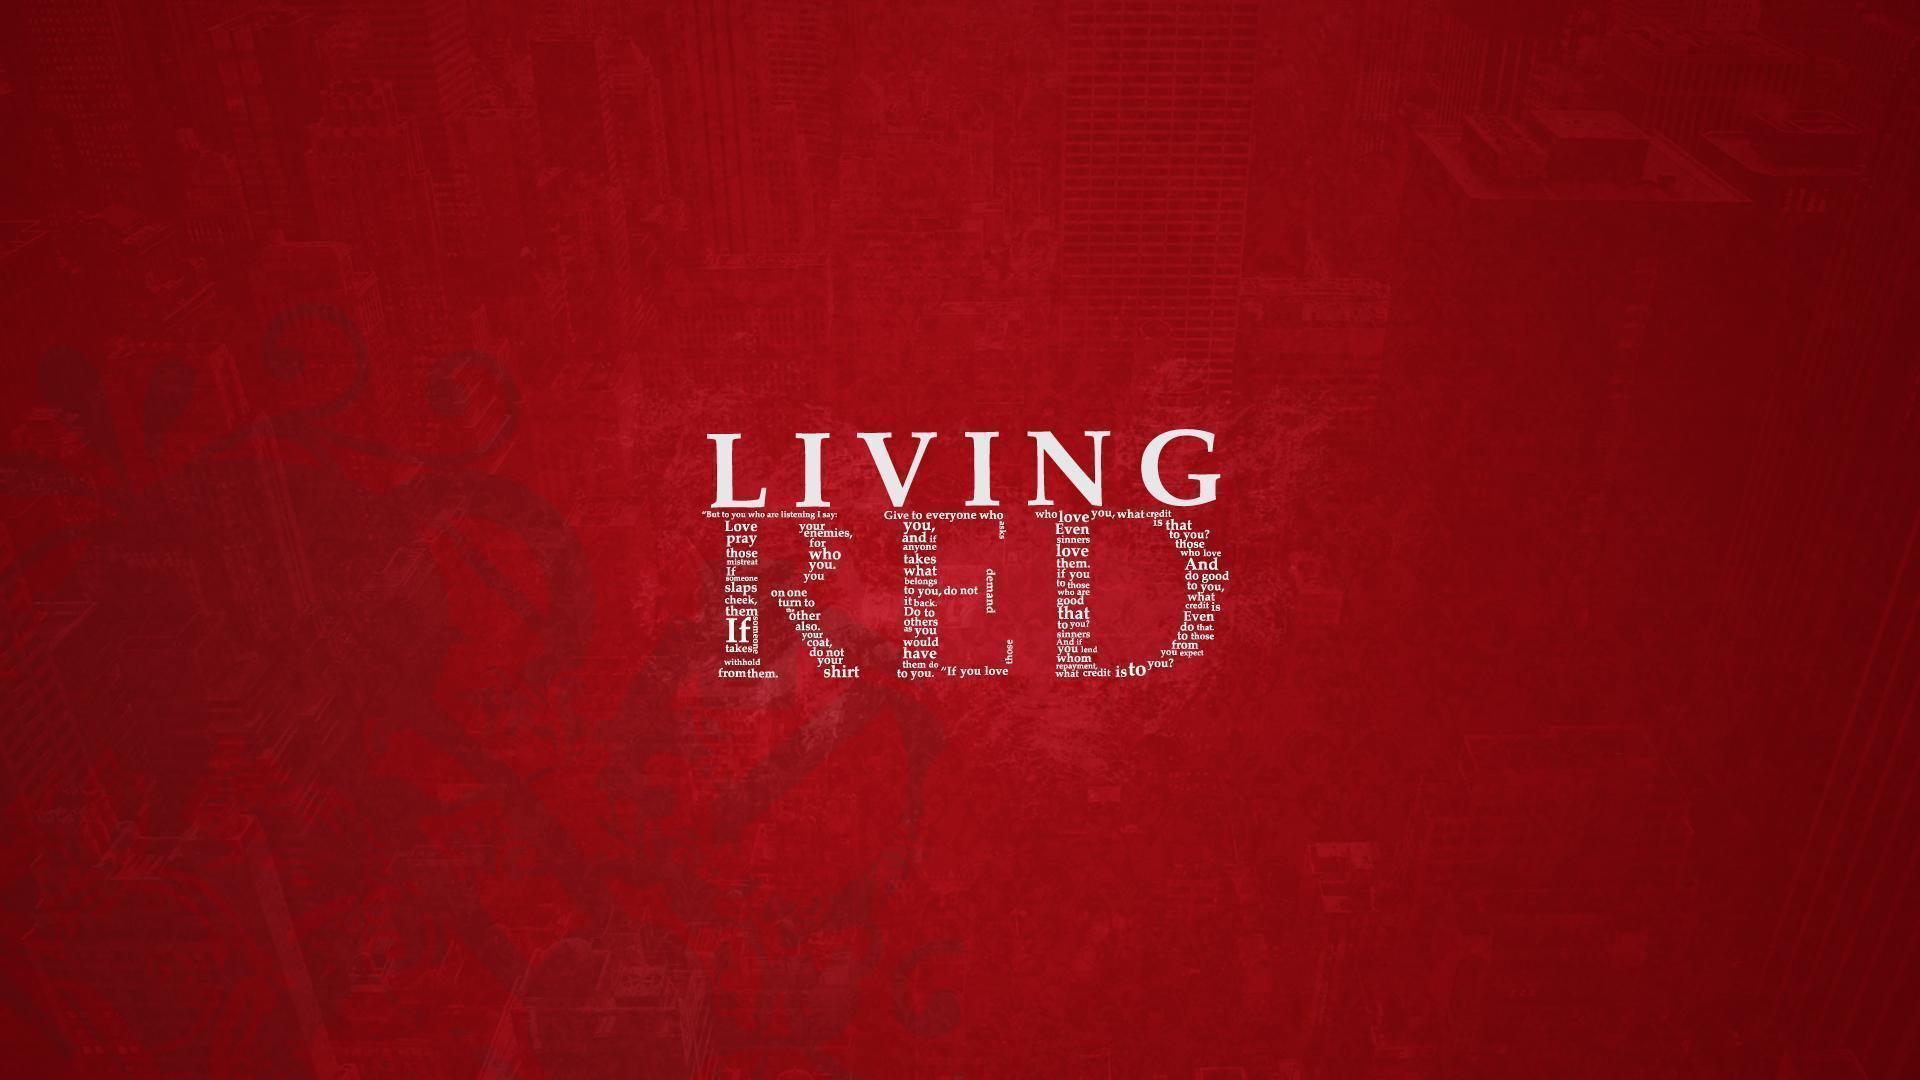 red desktop wallpaper download - photo #17